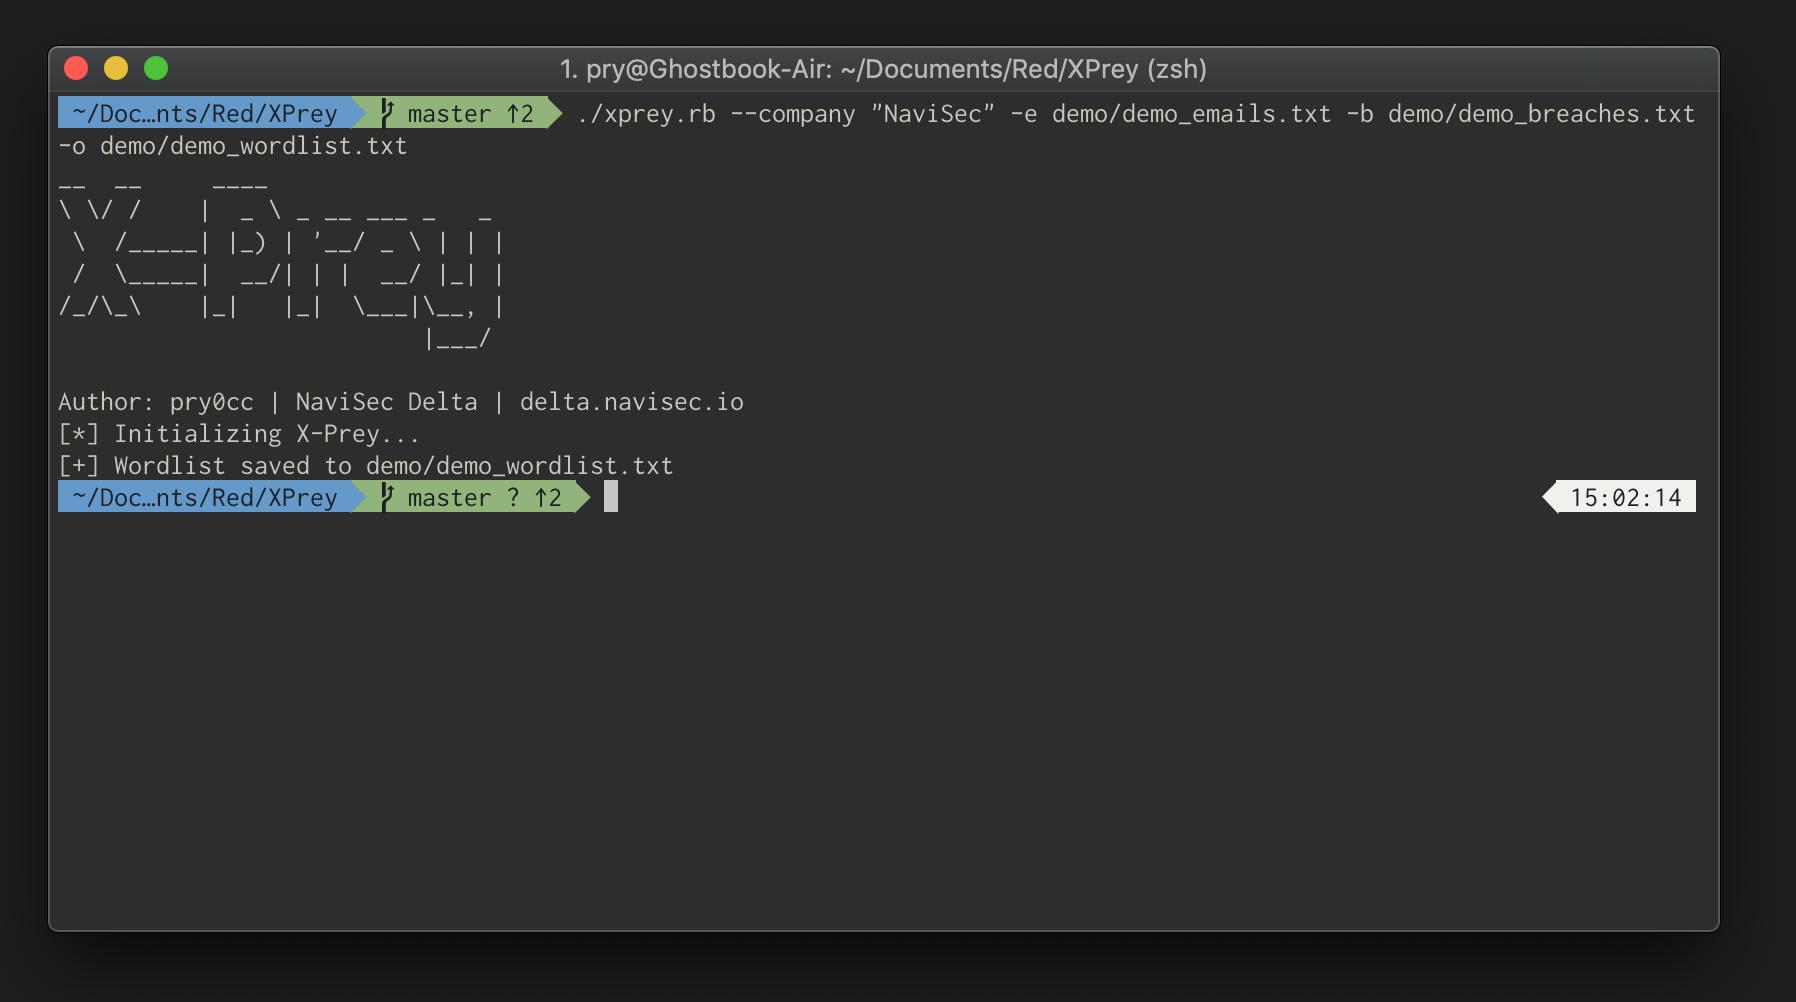 Using X-Prey to generate a wordlist